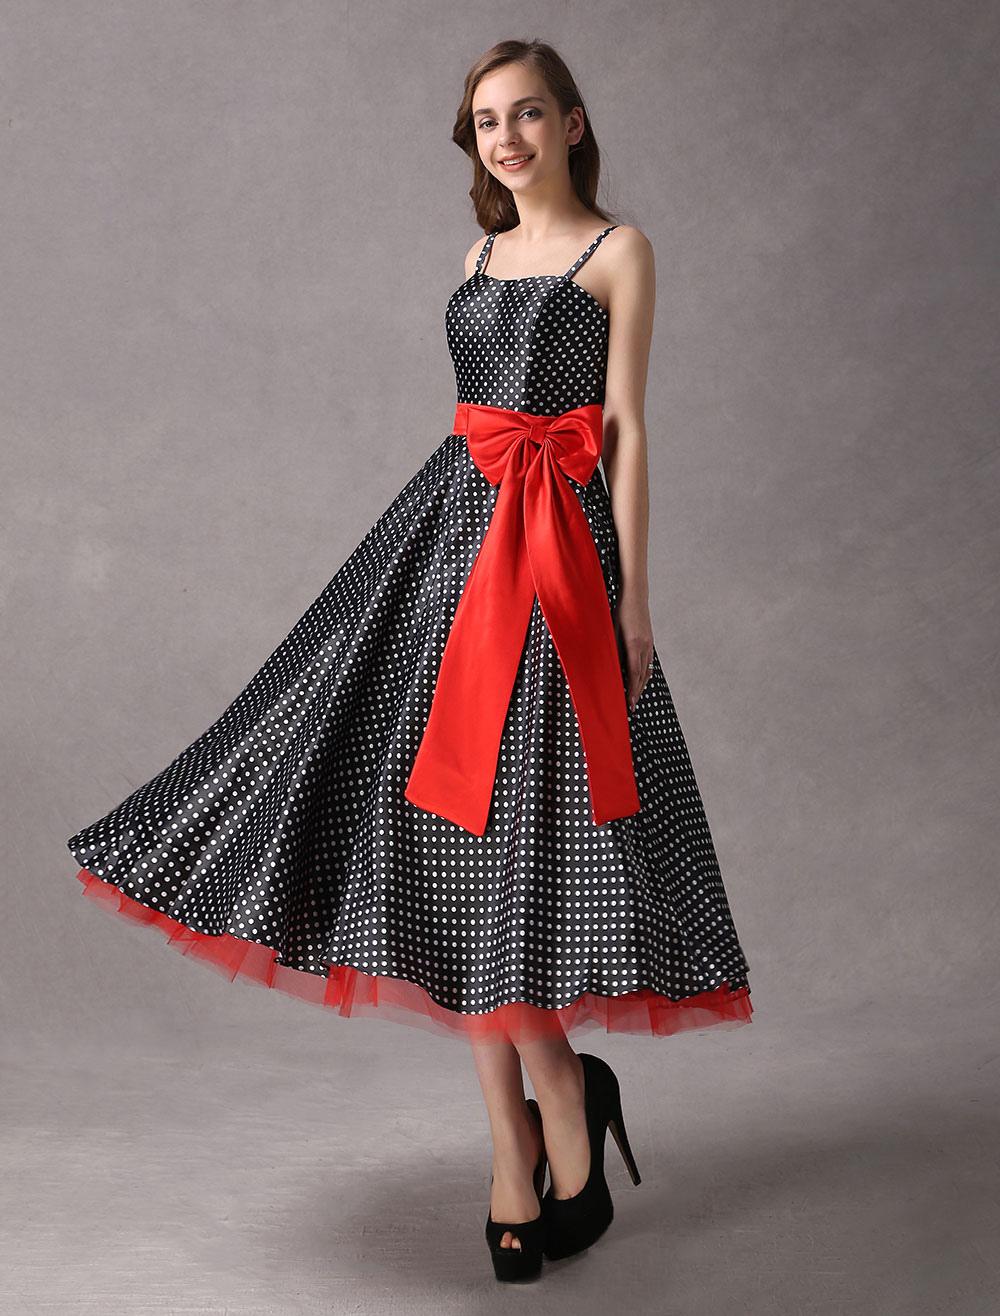 Rockabilly Bridesmaid Dresses Black Polka Dot Printed Vintage Ribbon Bow Sash Straps Tea Length Wedding Party Dress photo